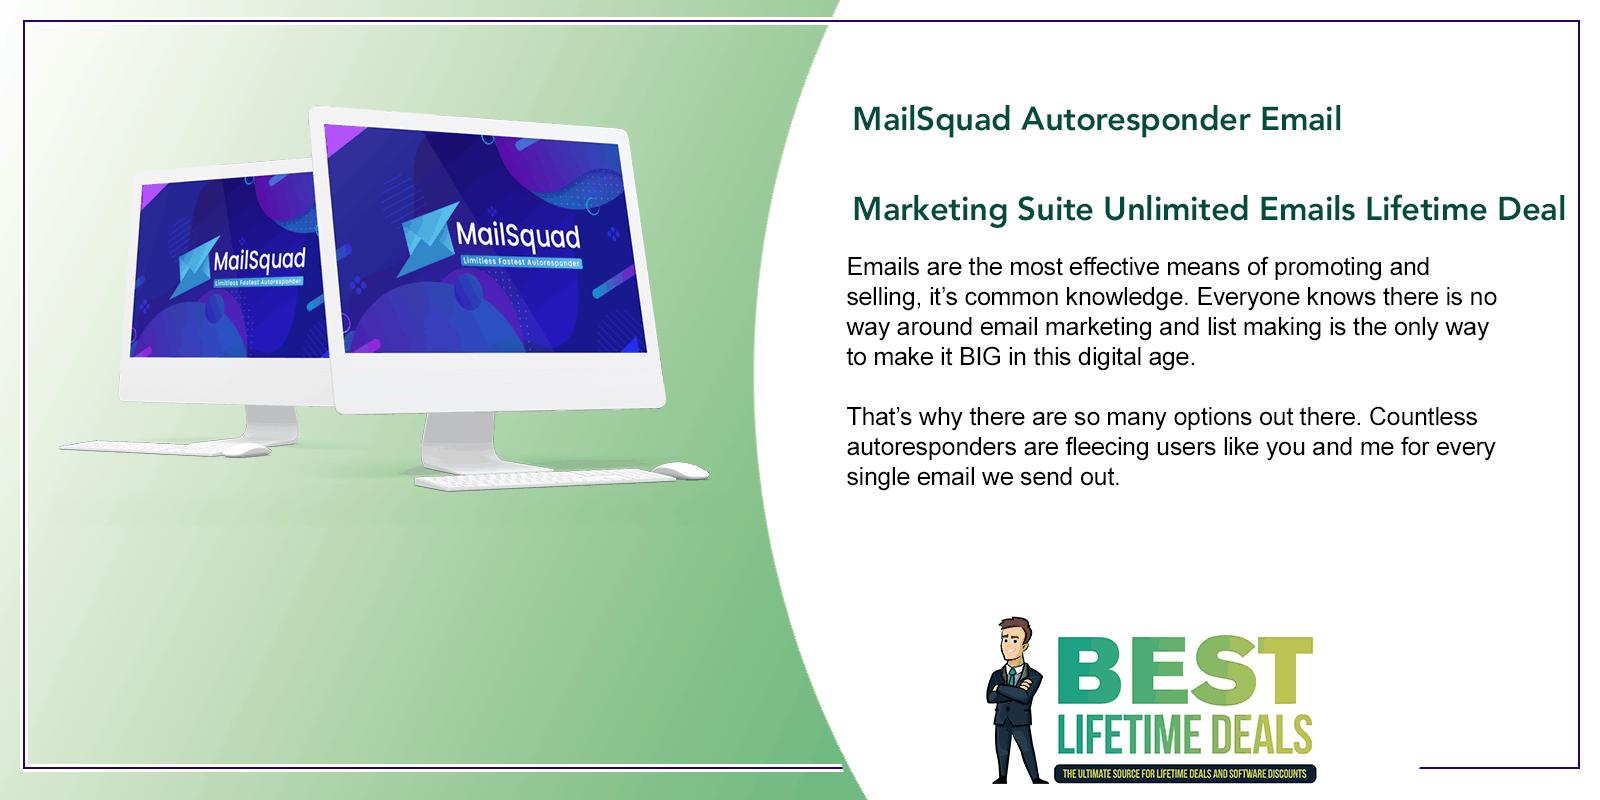 MailSquad Autoresponder Email Marketing Suite Unlimited Emails Featured Image